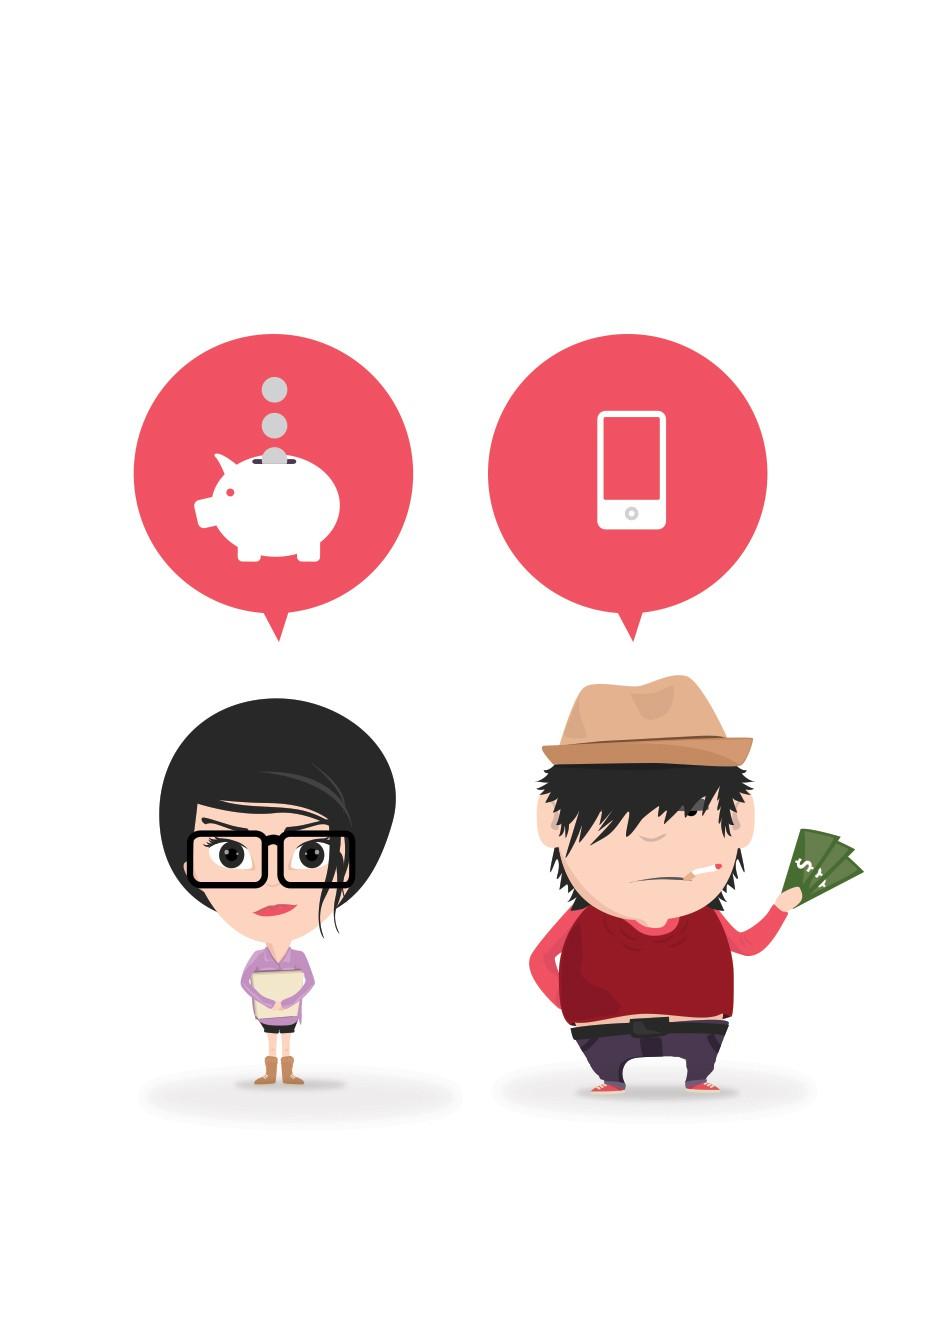 Stylish illustration of Girl & Boy